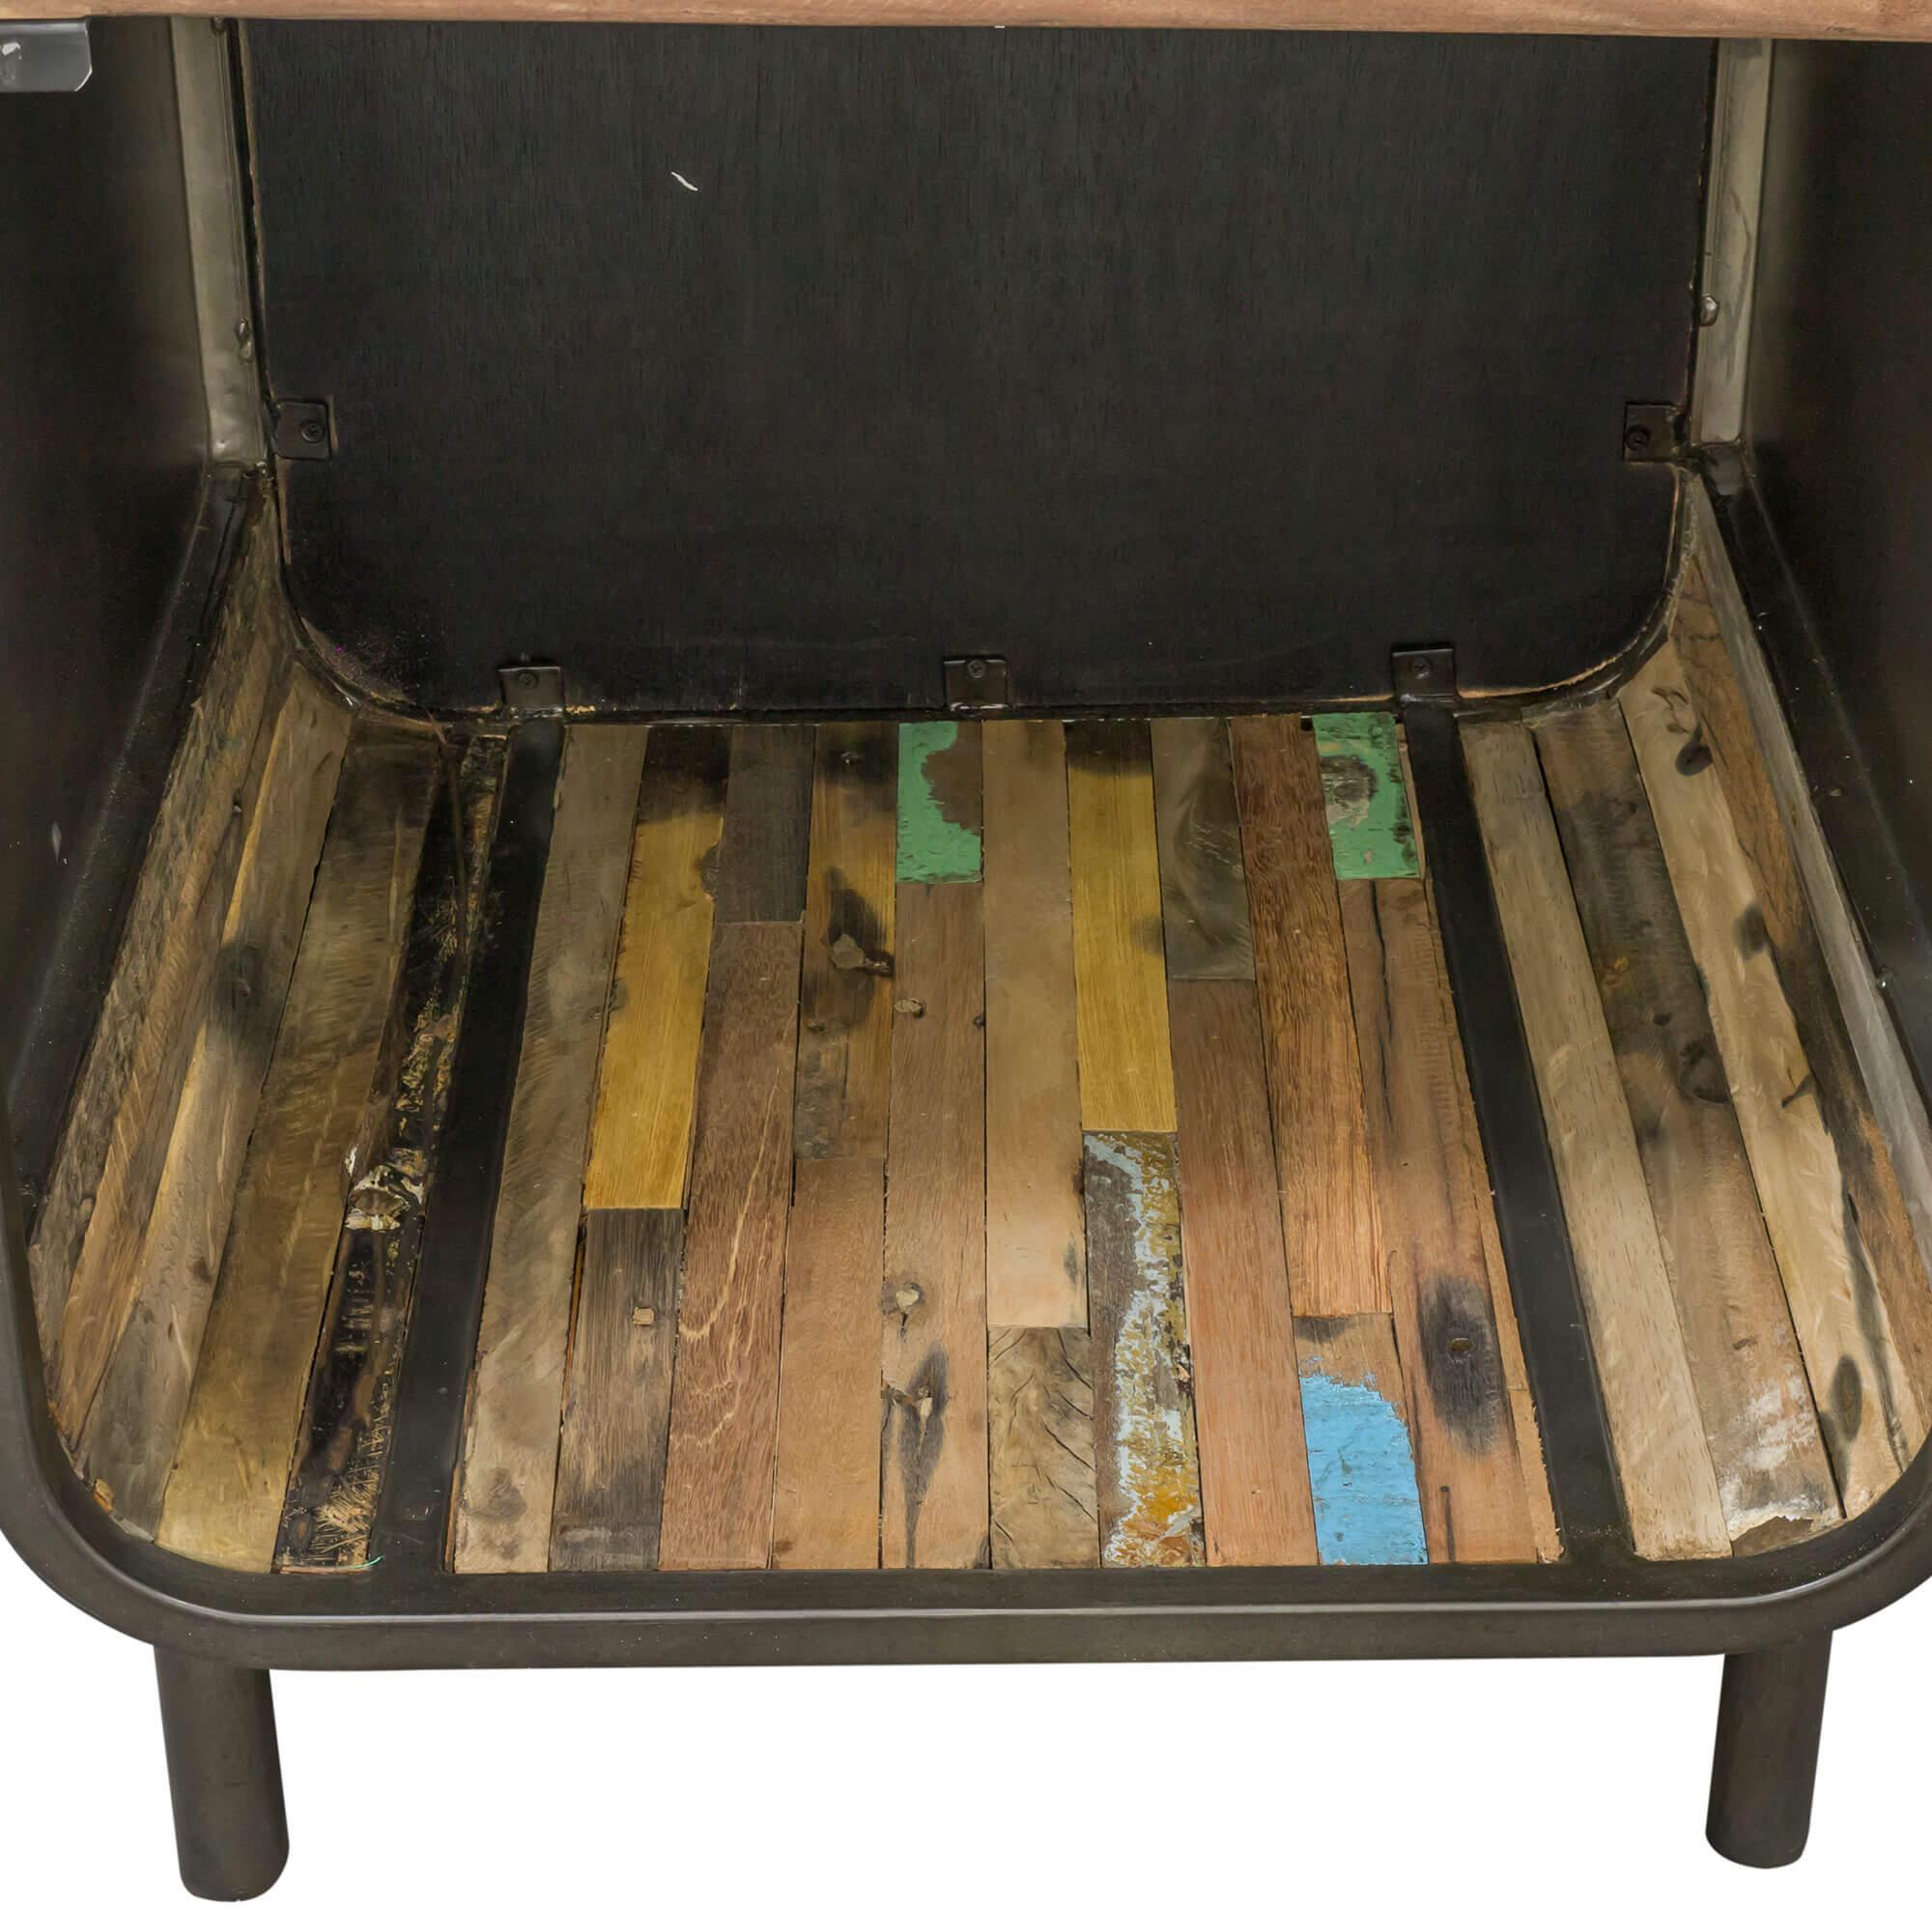 Light Wood Tone|Multi Seaside Retro Tall Cabinet with Shelves & Door